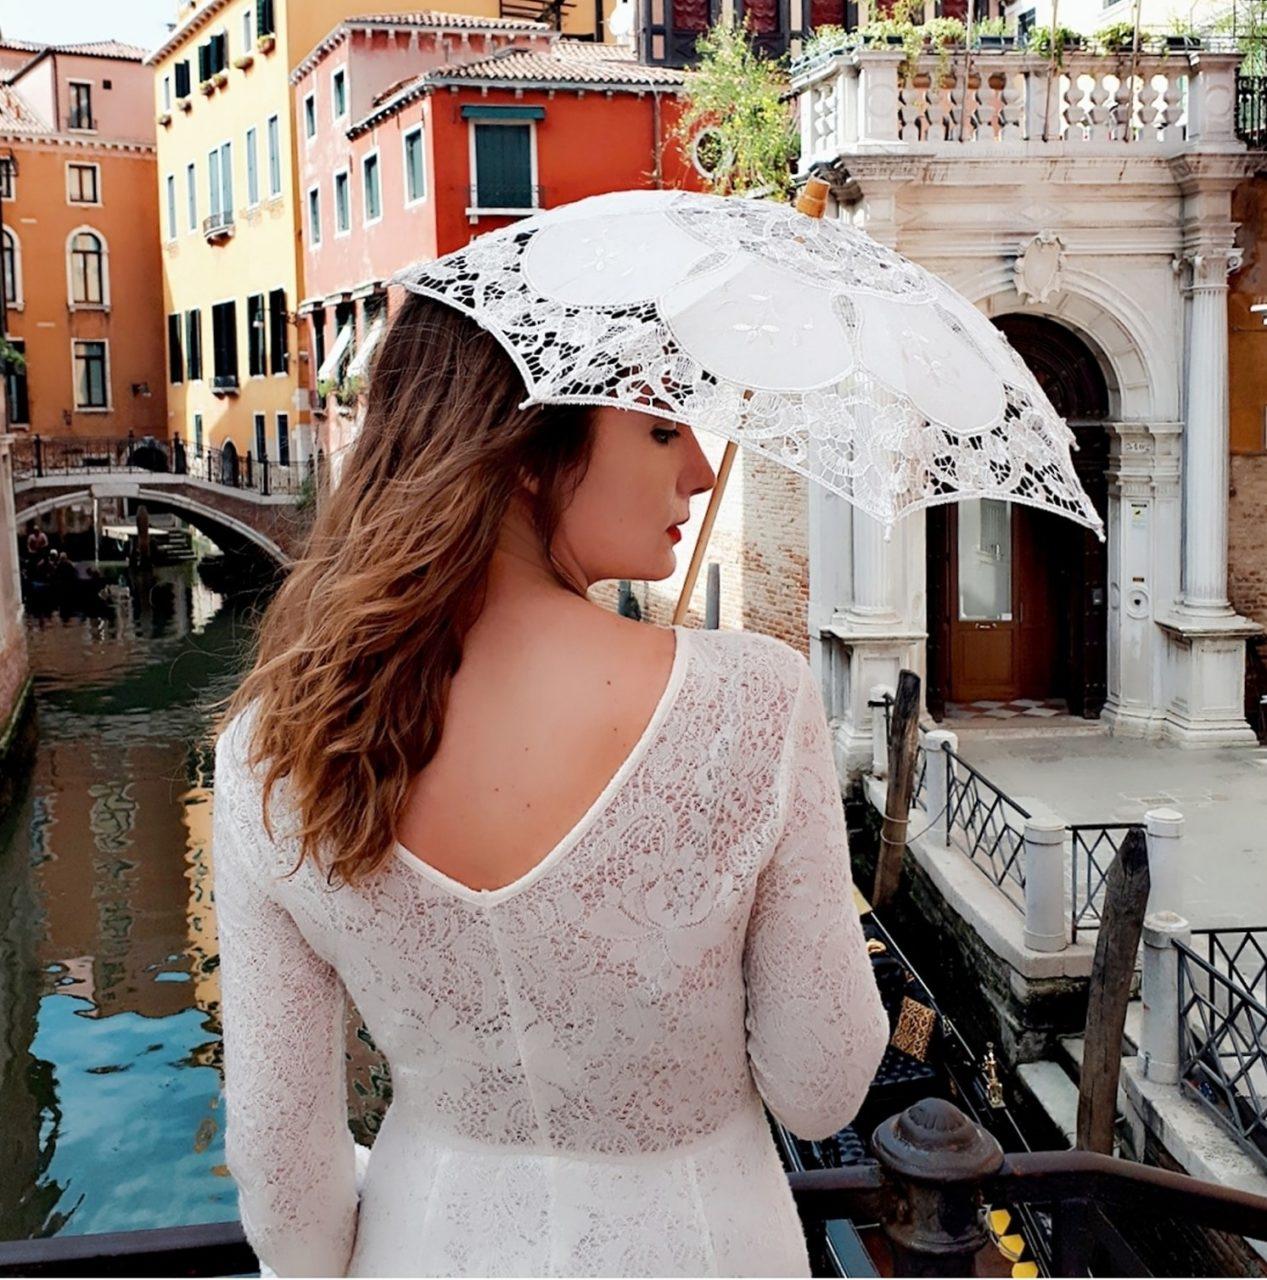 rossella oppes venezia